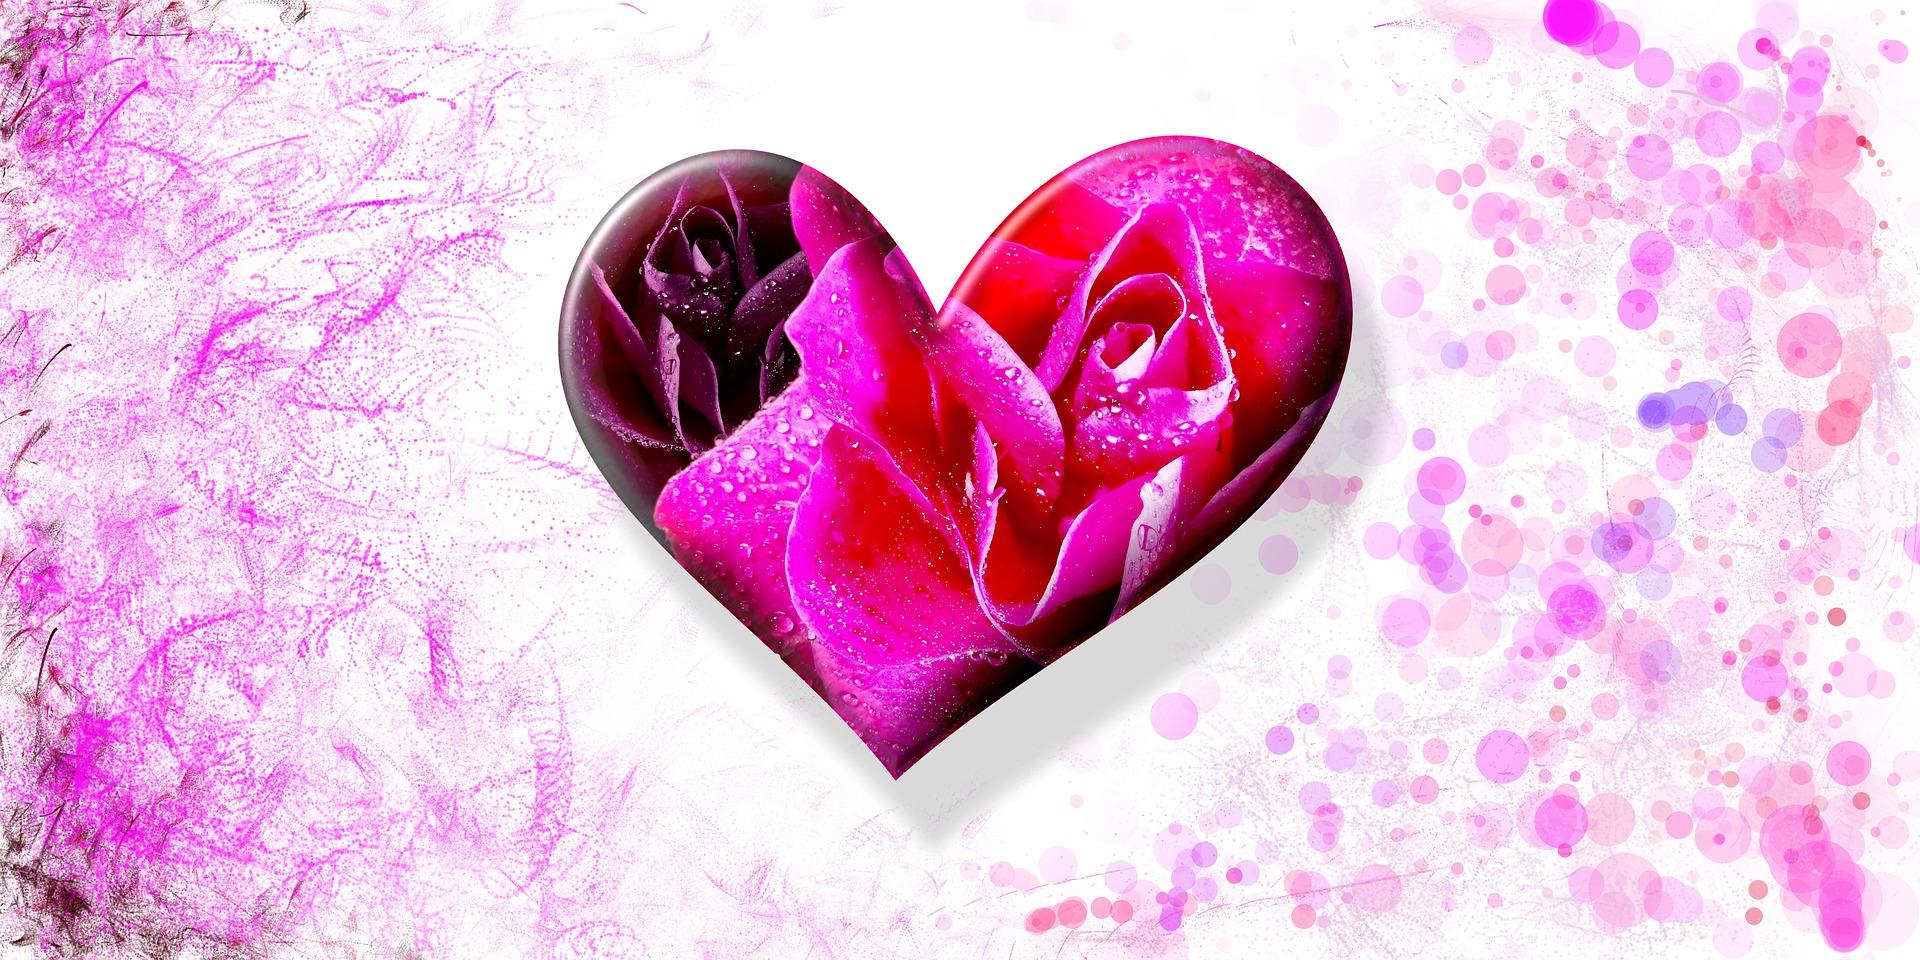 Valetijnsdag